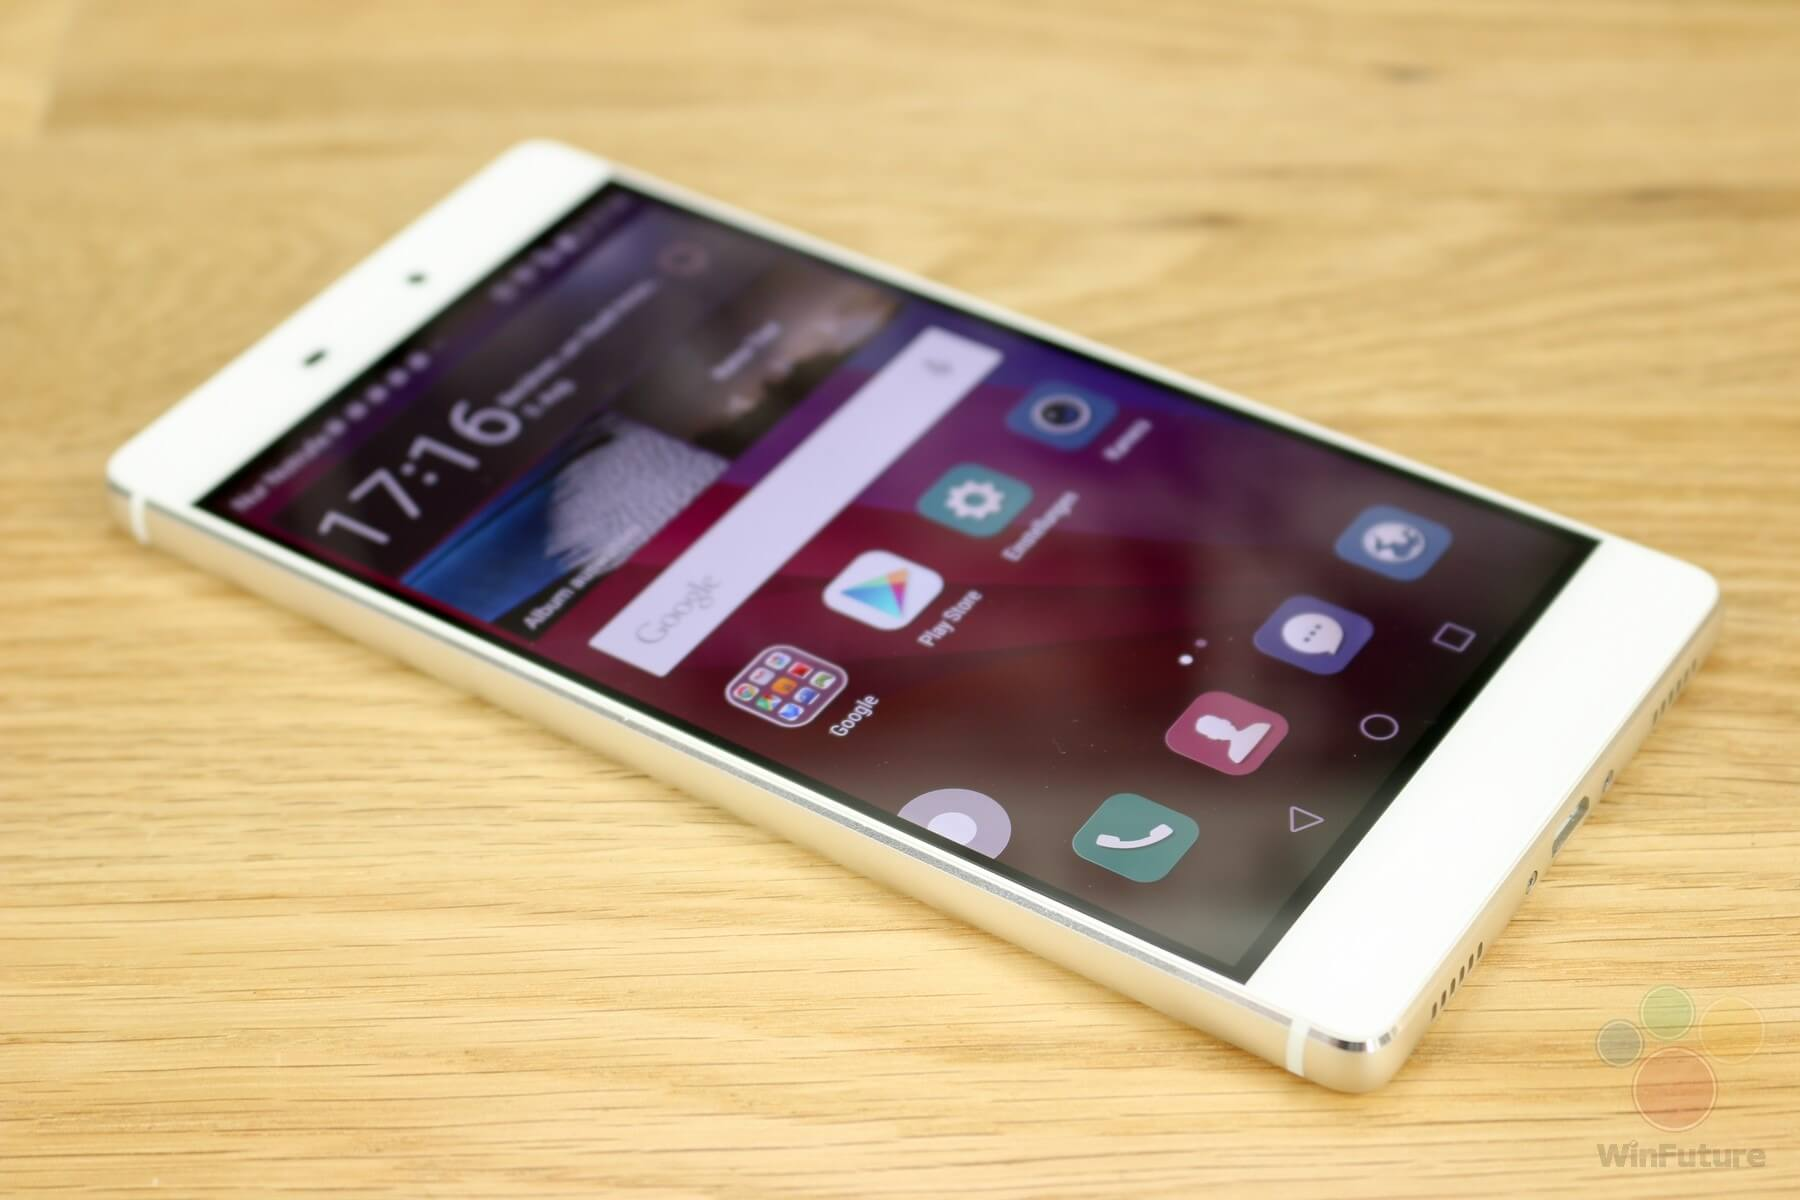 Huawei P8 Im Langzeit Test Geheimtipp Unter Den Top Smartphones